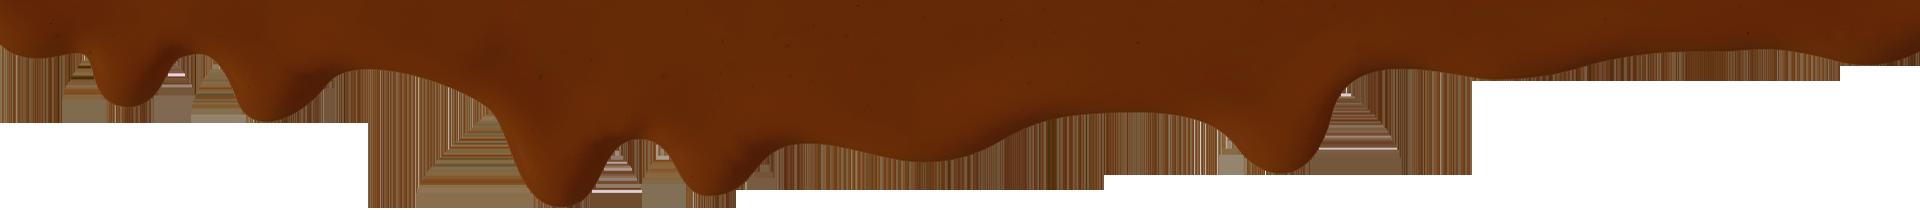 https://sorvetesygloo.com.br/2019/wp-content/uploads/2018/12/chocolate.png